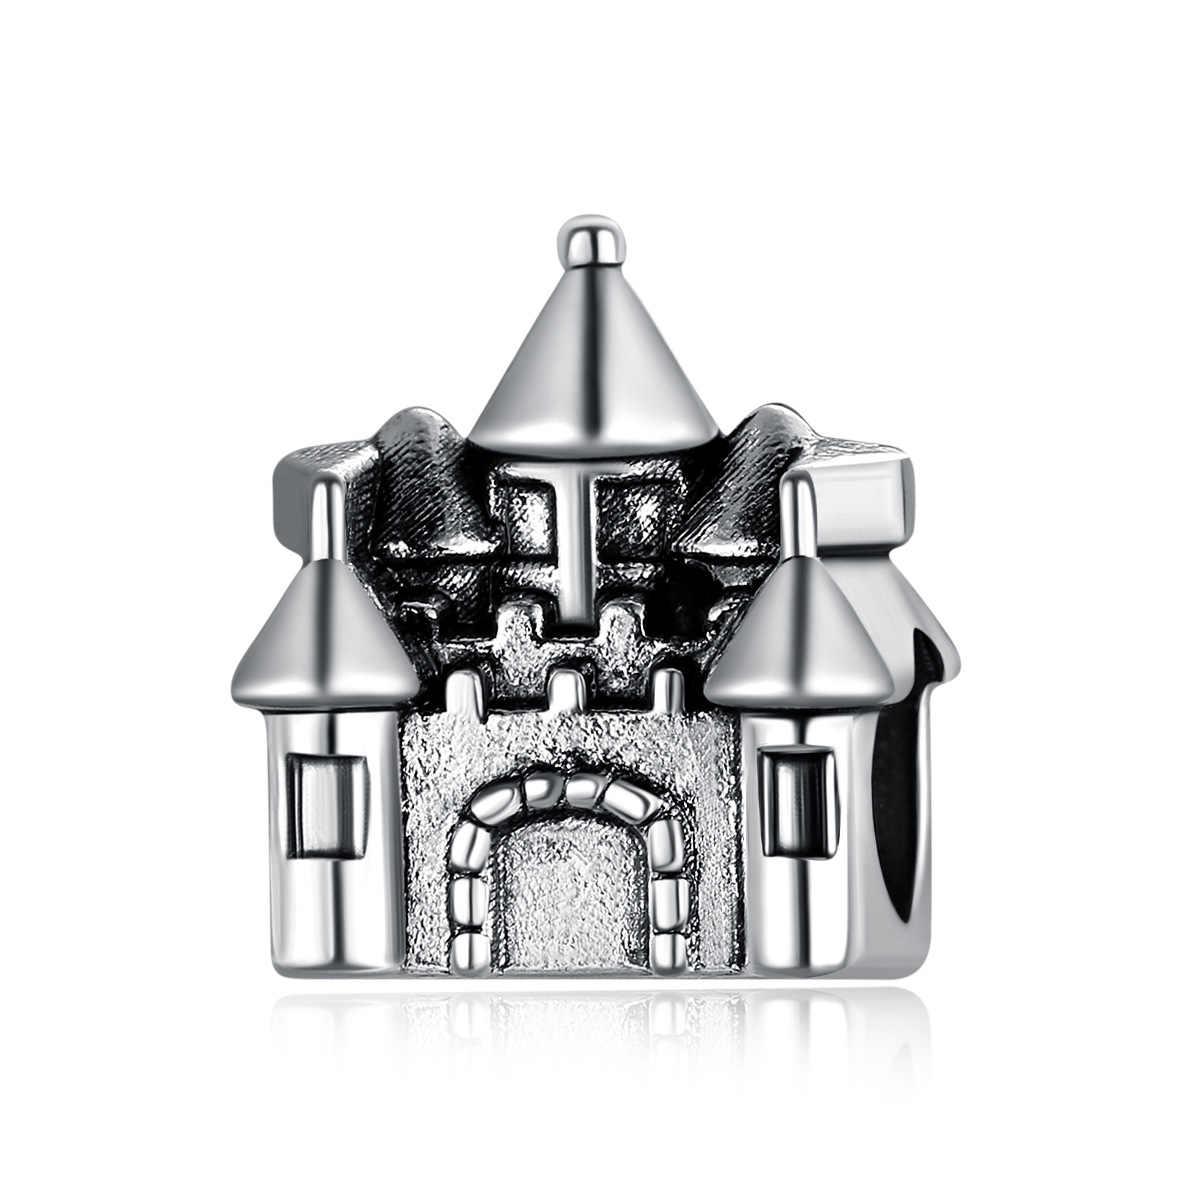 Fit Pandora Charms สร้อยข้อมือลูกปัดสำหรับเครื่องประดับวันวาเลนไทน์ Poppins Bijoux Sieraden เครื่องประดับ 278